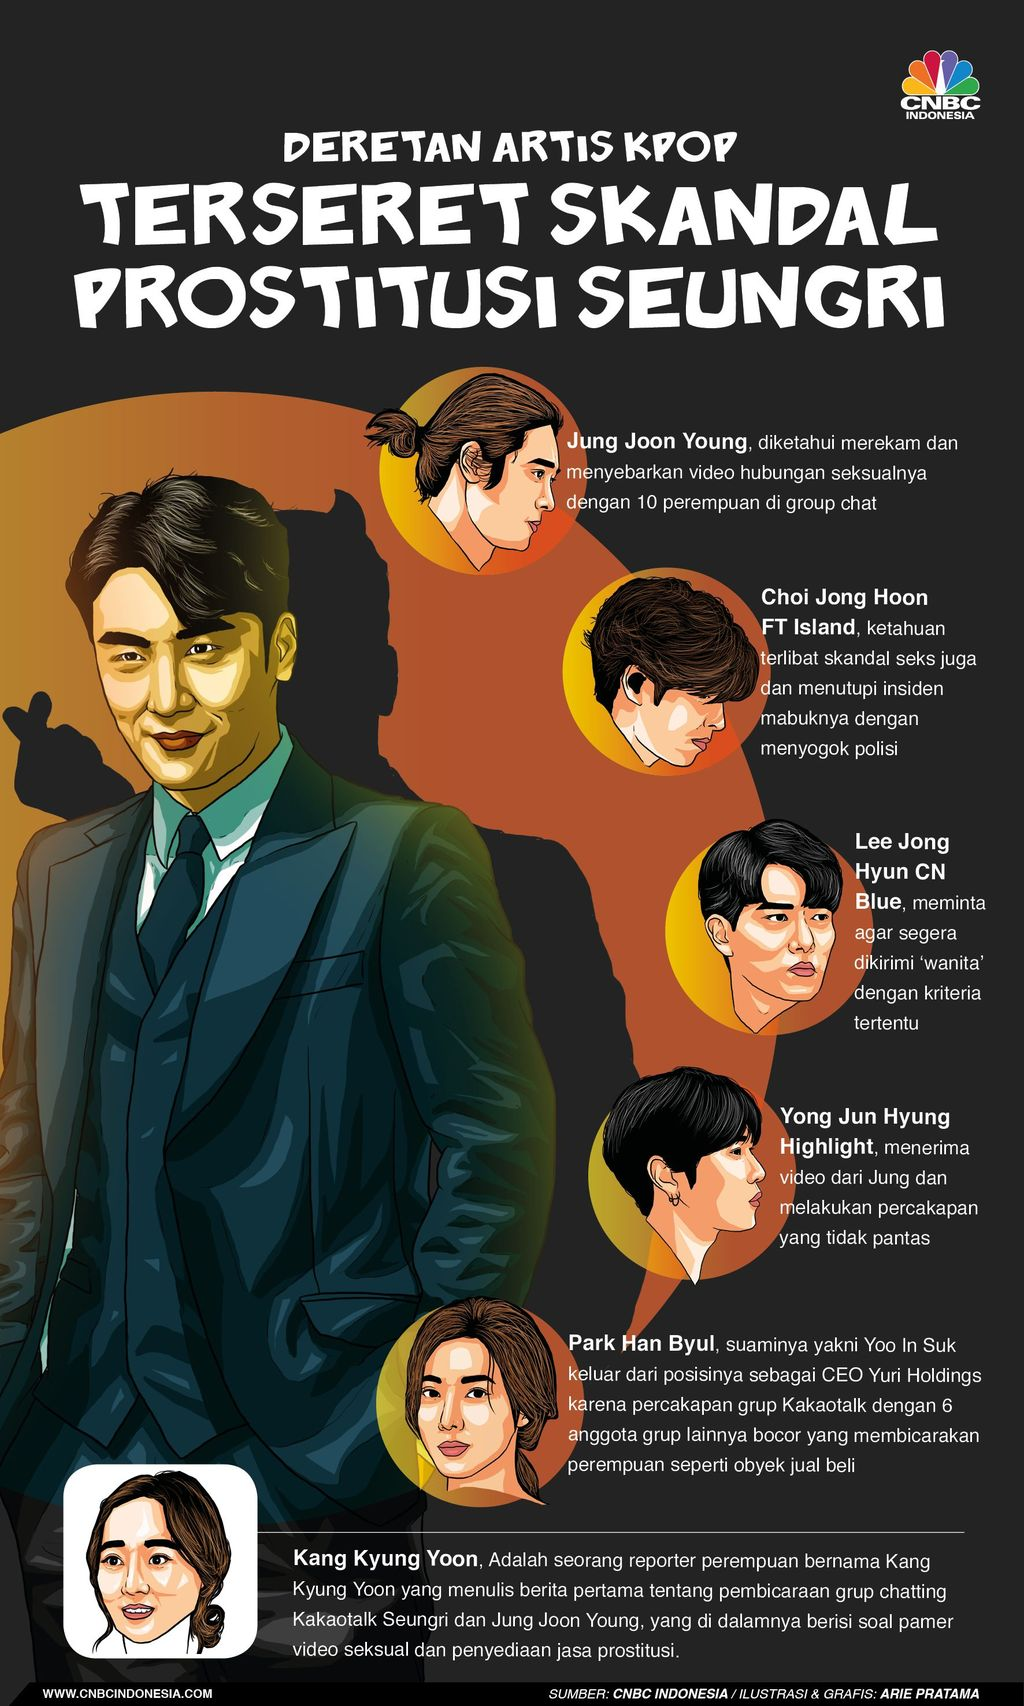 Infografis: Deretan Artis Kpop yang Terseret Skandal Prostitusi Seungri